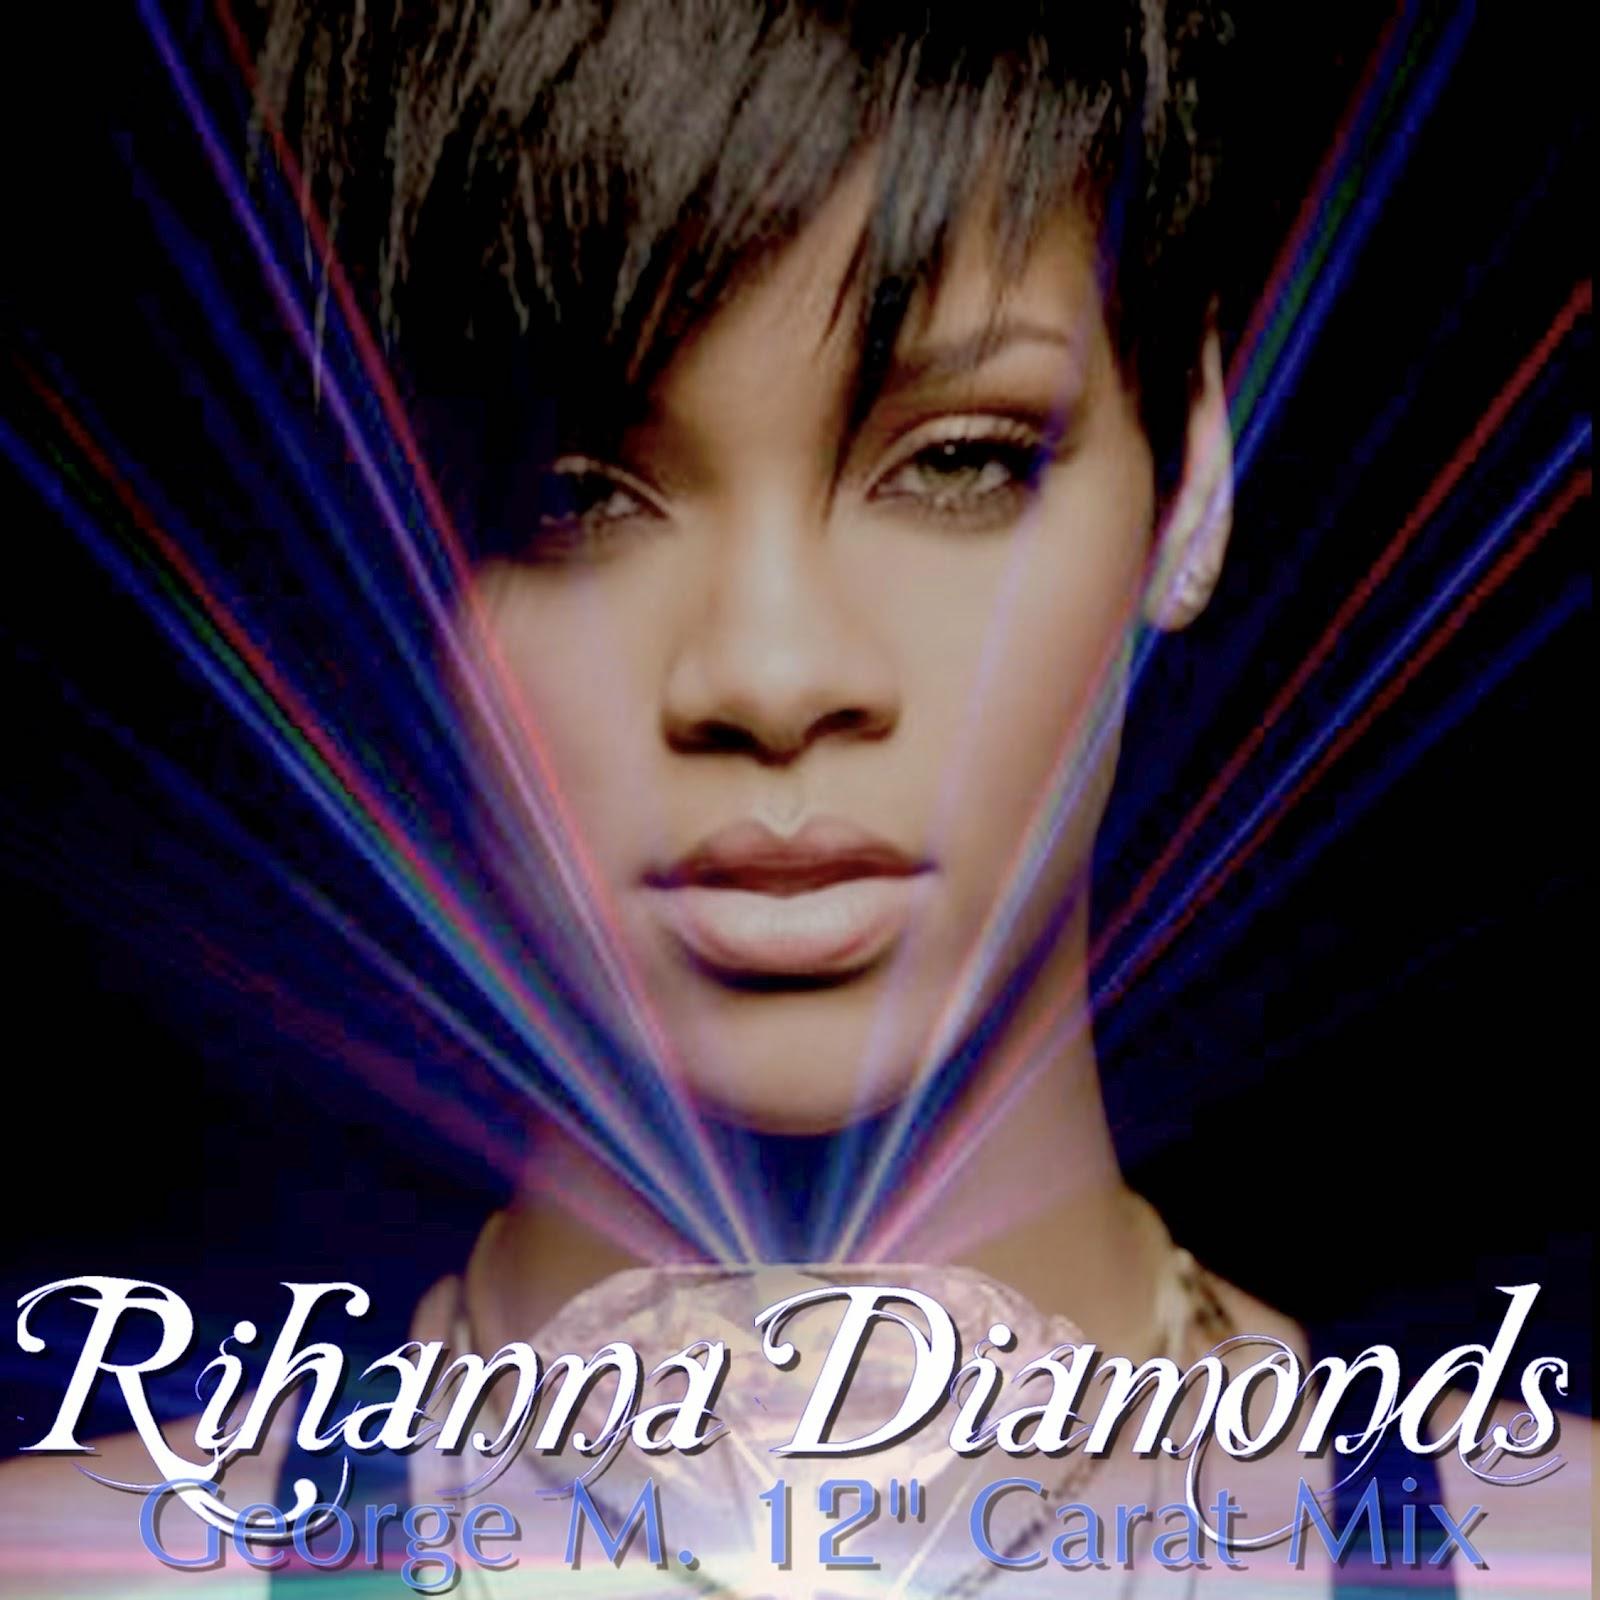 Rihanna - Diamonds Instrumental + Free mp3 download! - YouTube